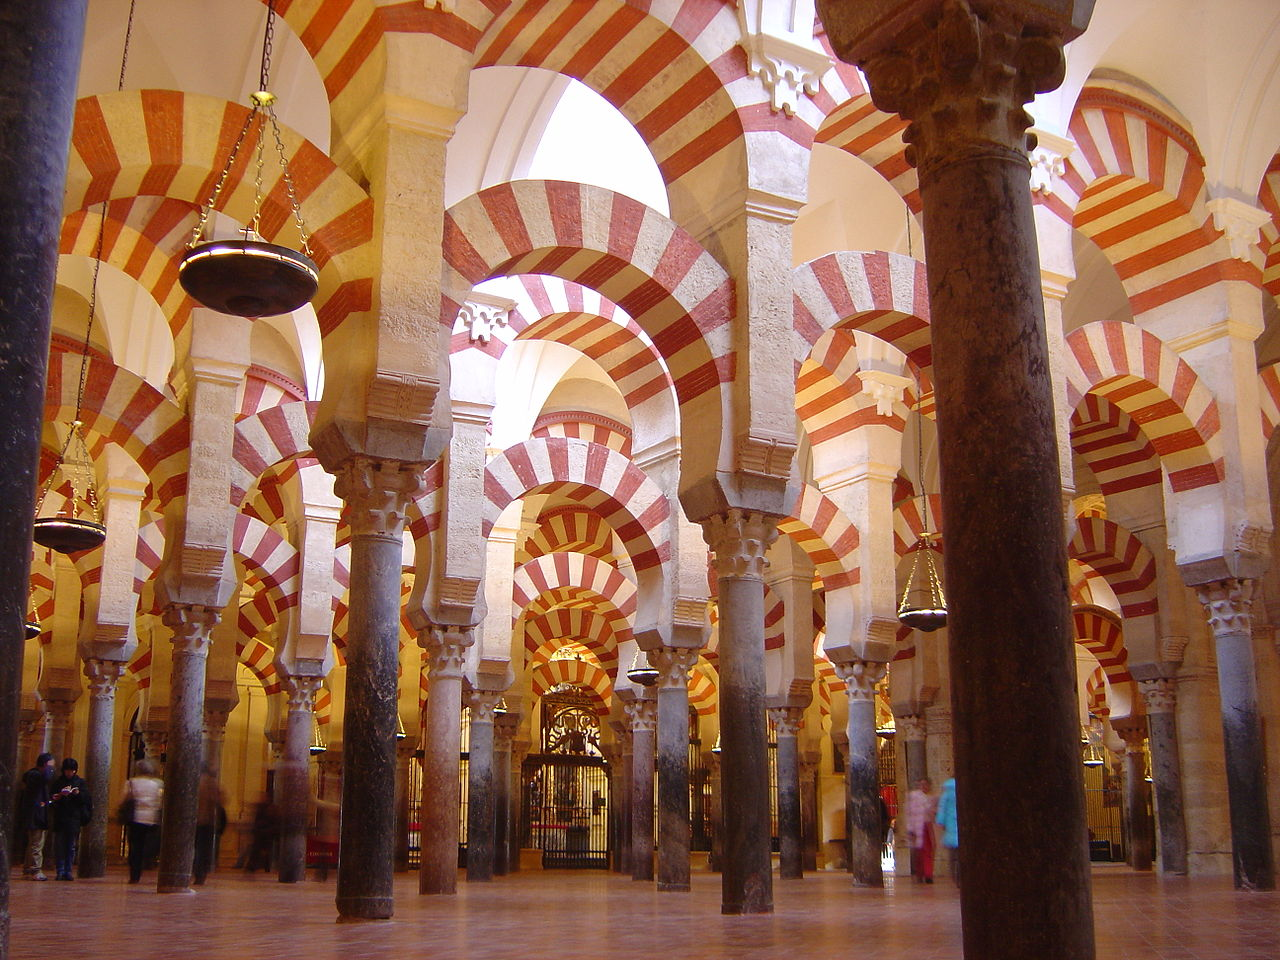 https://upload.wikimedia.org/wikipedia/commons/thumb/1/15/Mosque_Cordoba.jpg/1280px-Mosque_Cordoba.jpg